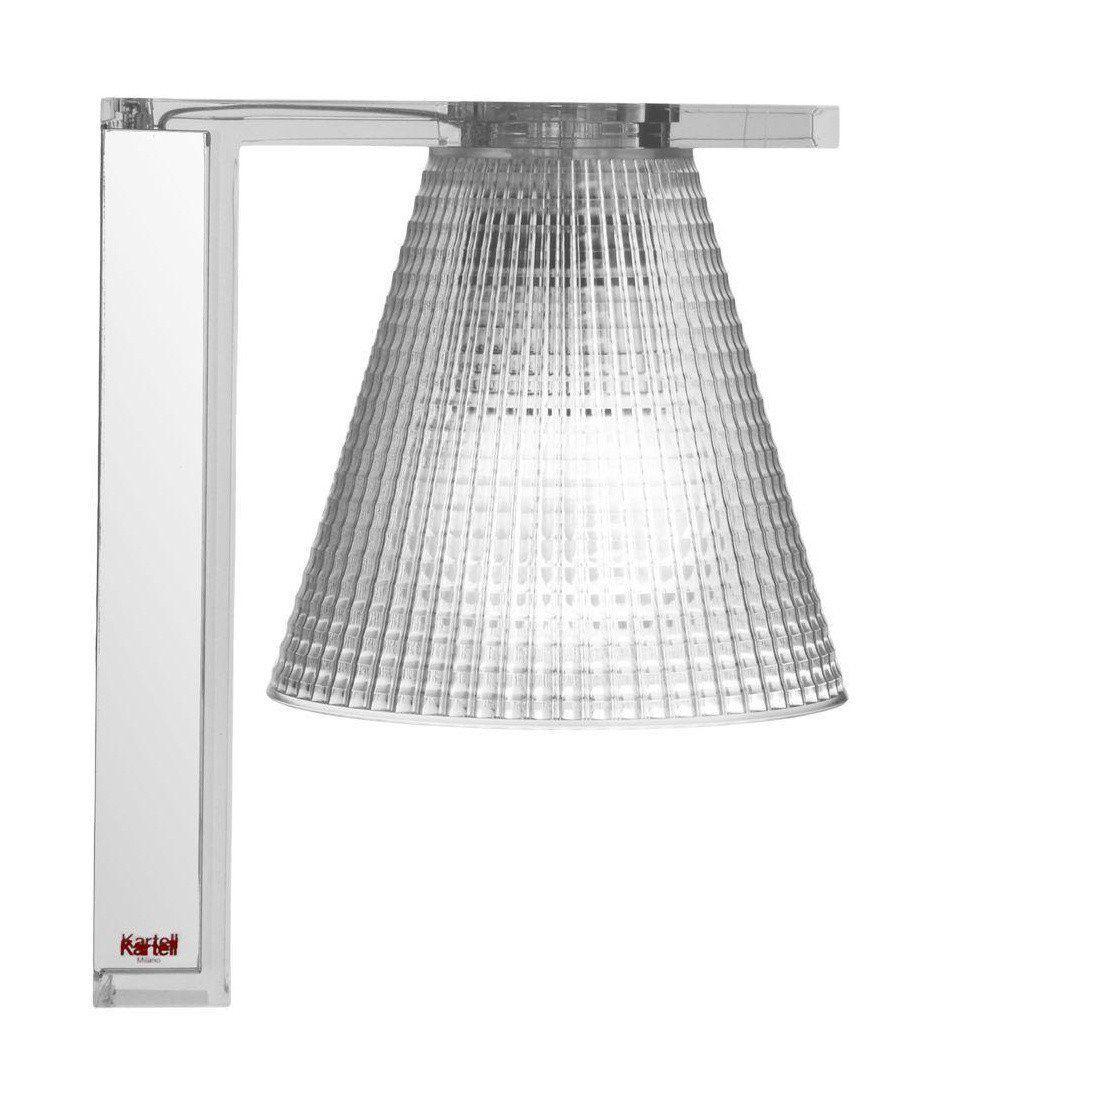 Kartell light air wall lamp ambientedirect kartell light air wall lamp exclusive sale only for styleclub members aloadofball Images